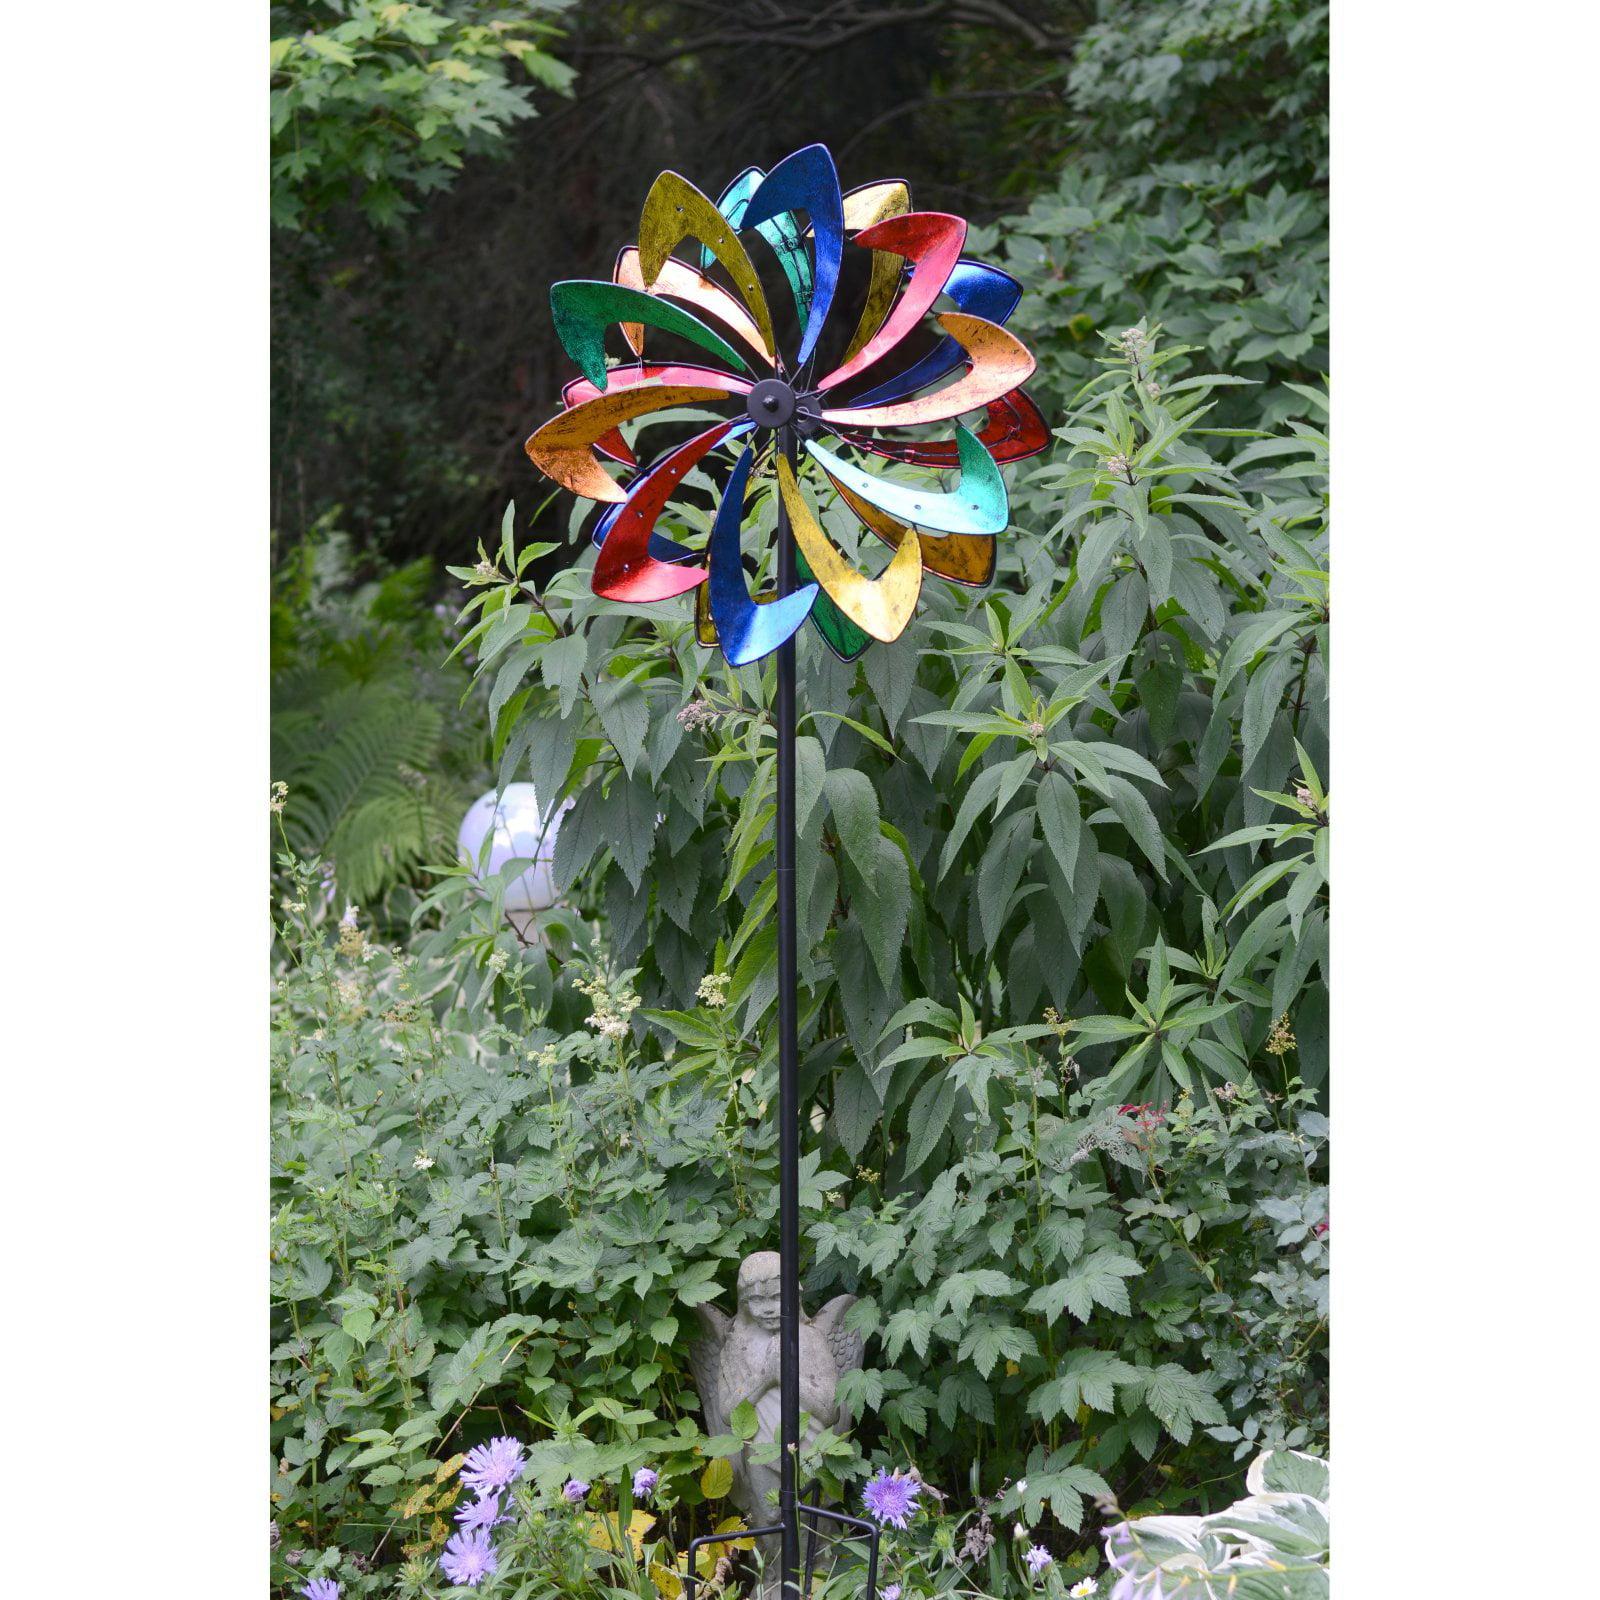 Red Carpet Studios 75 in. Multi Color Petal Wind Spinner by Red Carpet Studios